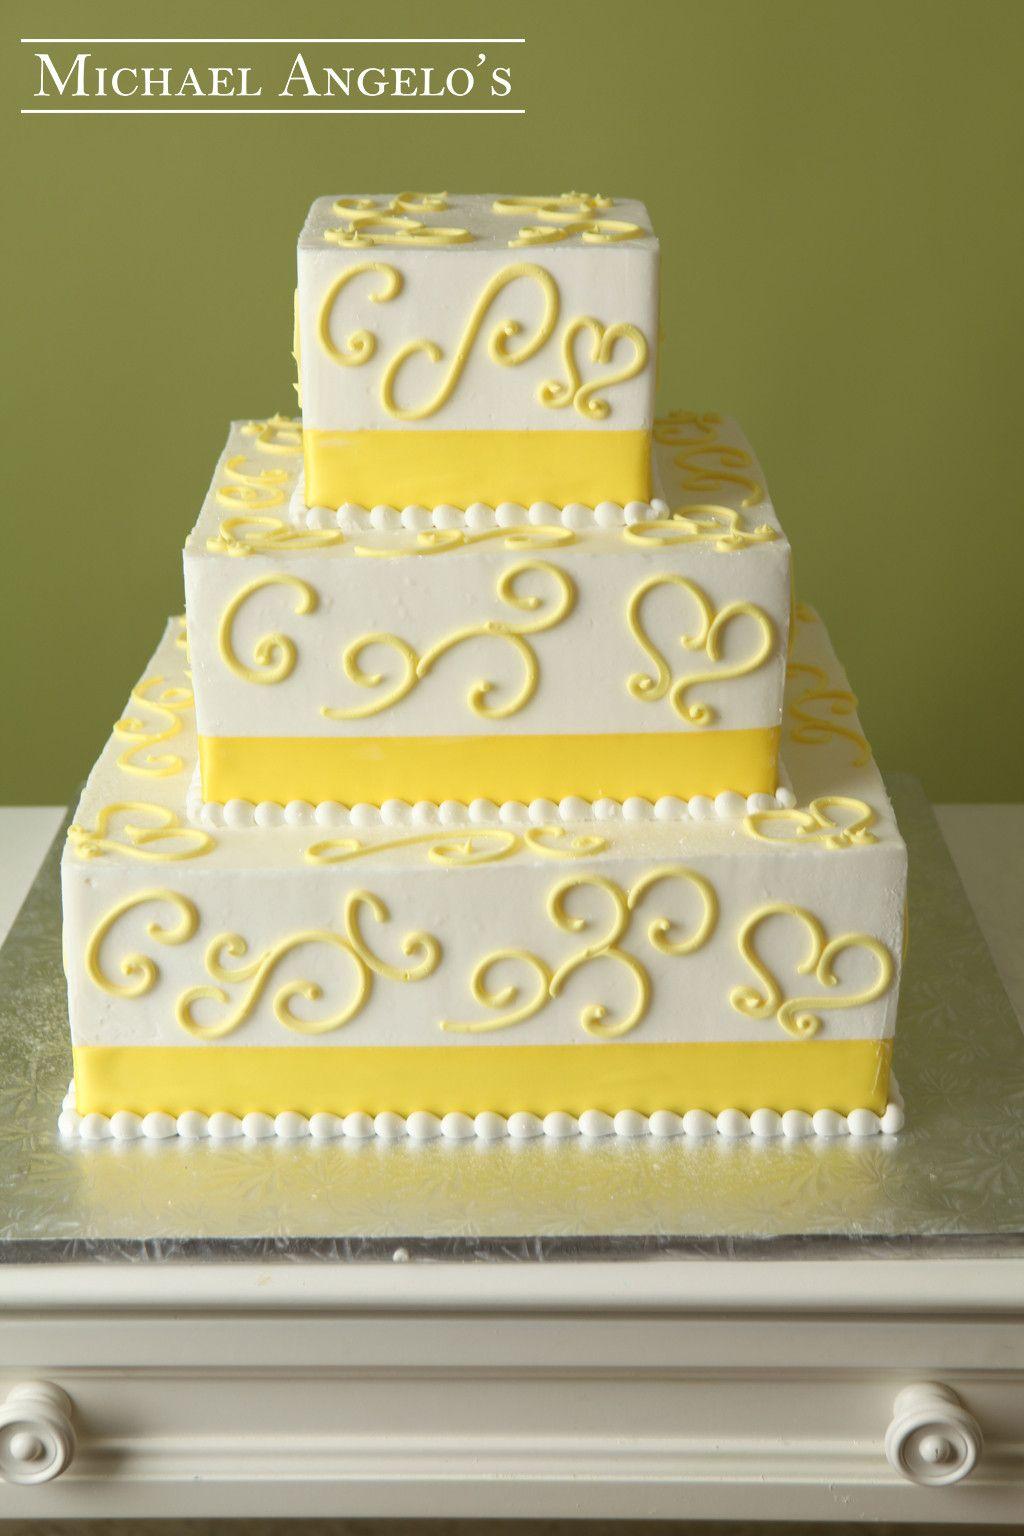 Michaelangelo wedding dress  Yellow Swirls Ribbons  Events Weddings Cakes Design  Shape